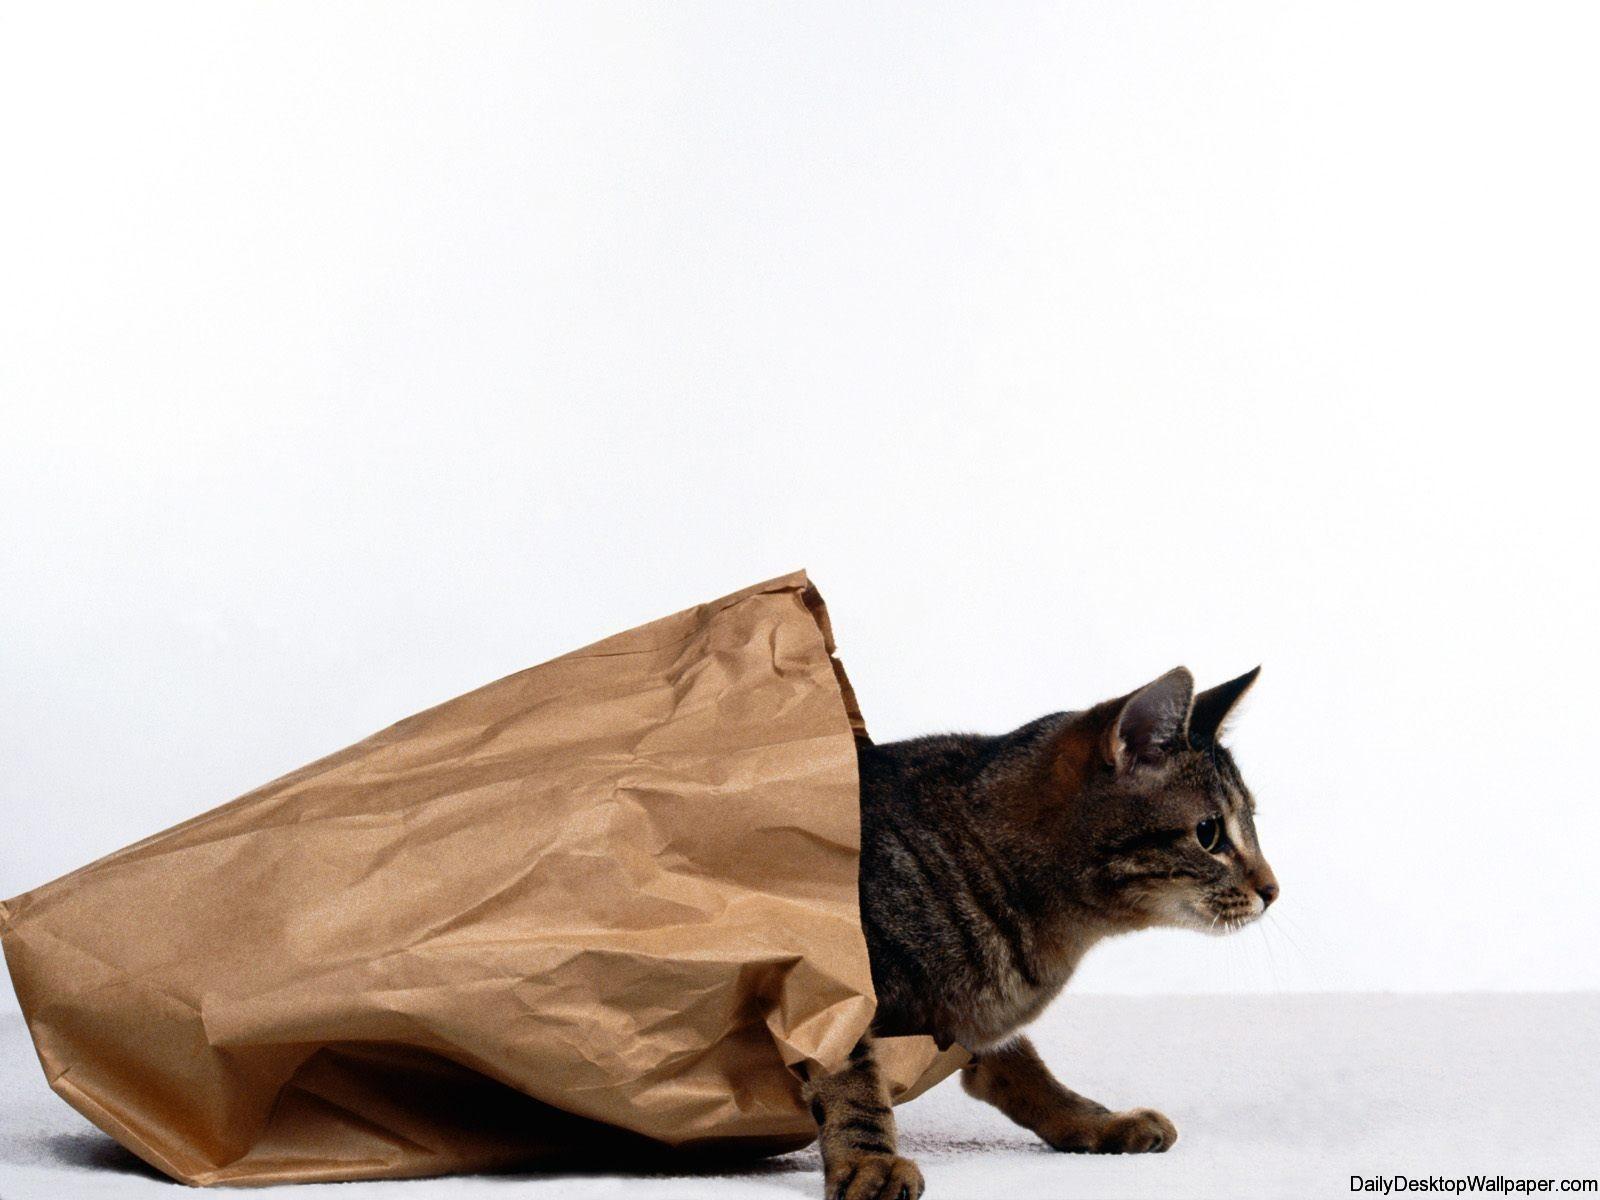 Cat in a bag wallpaper